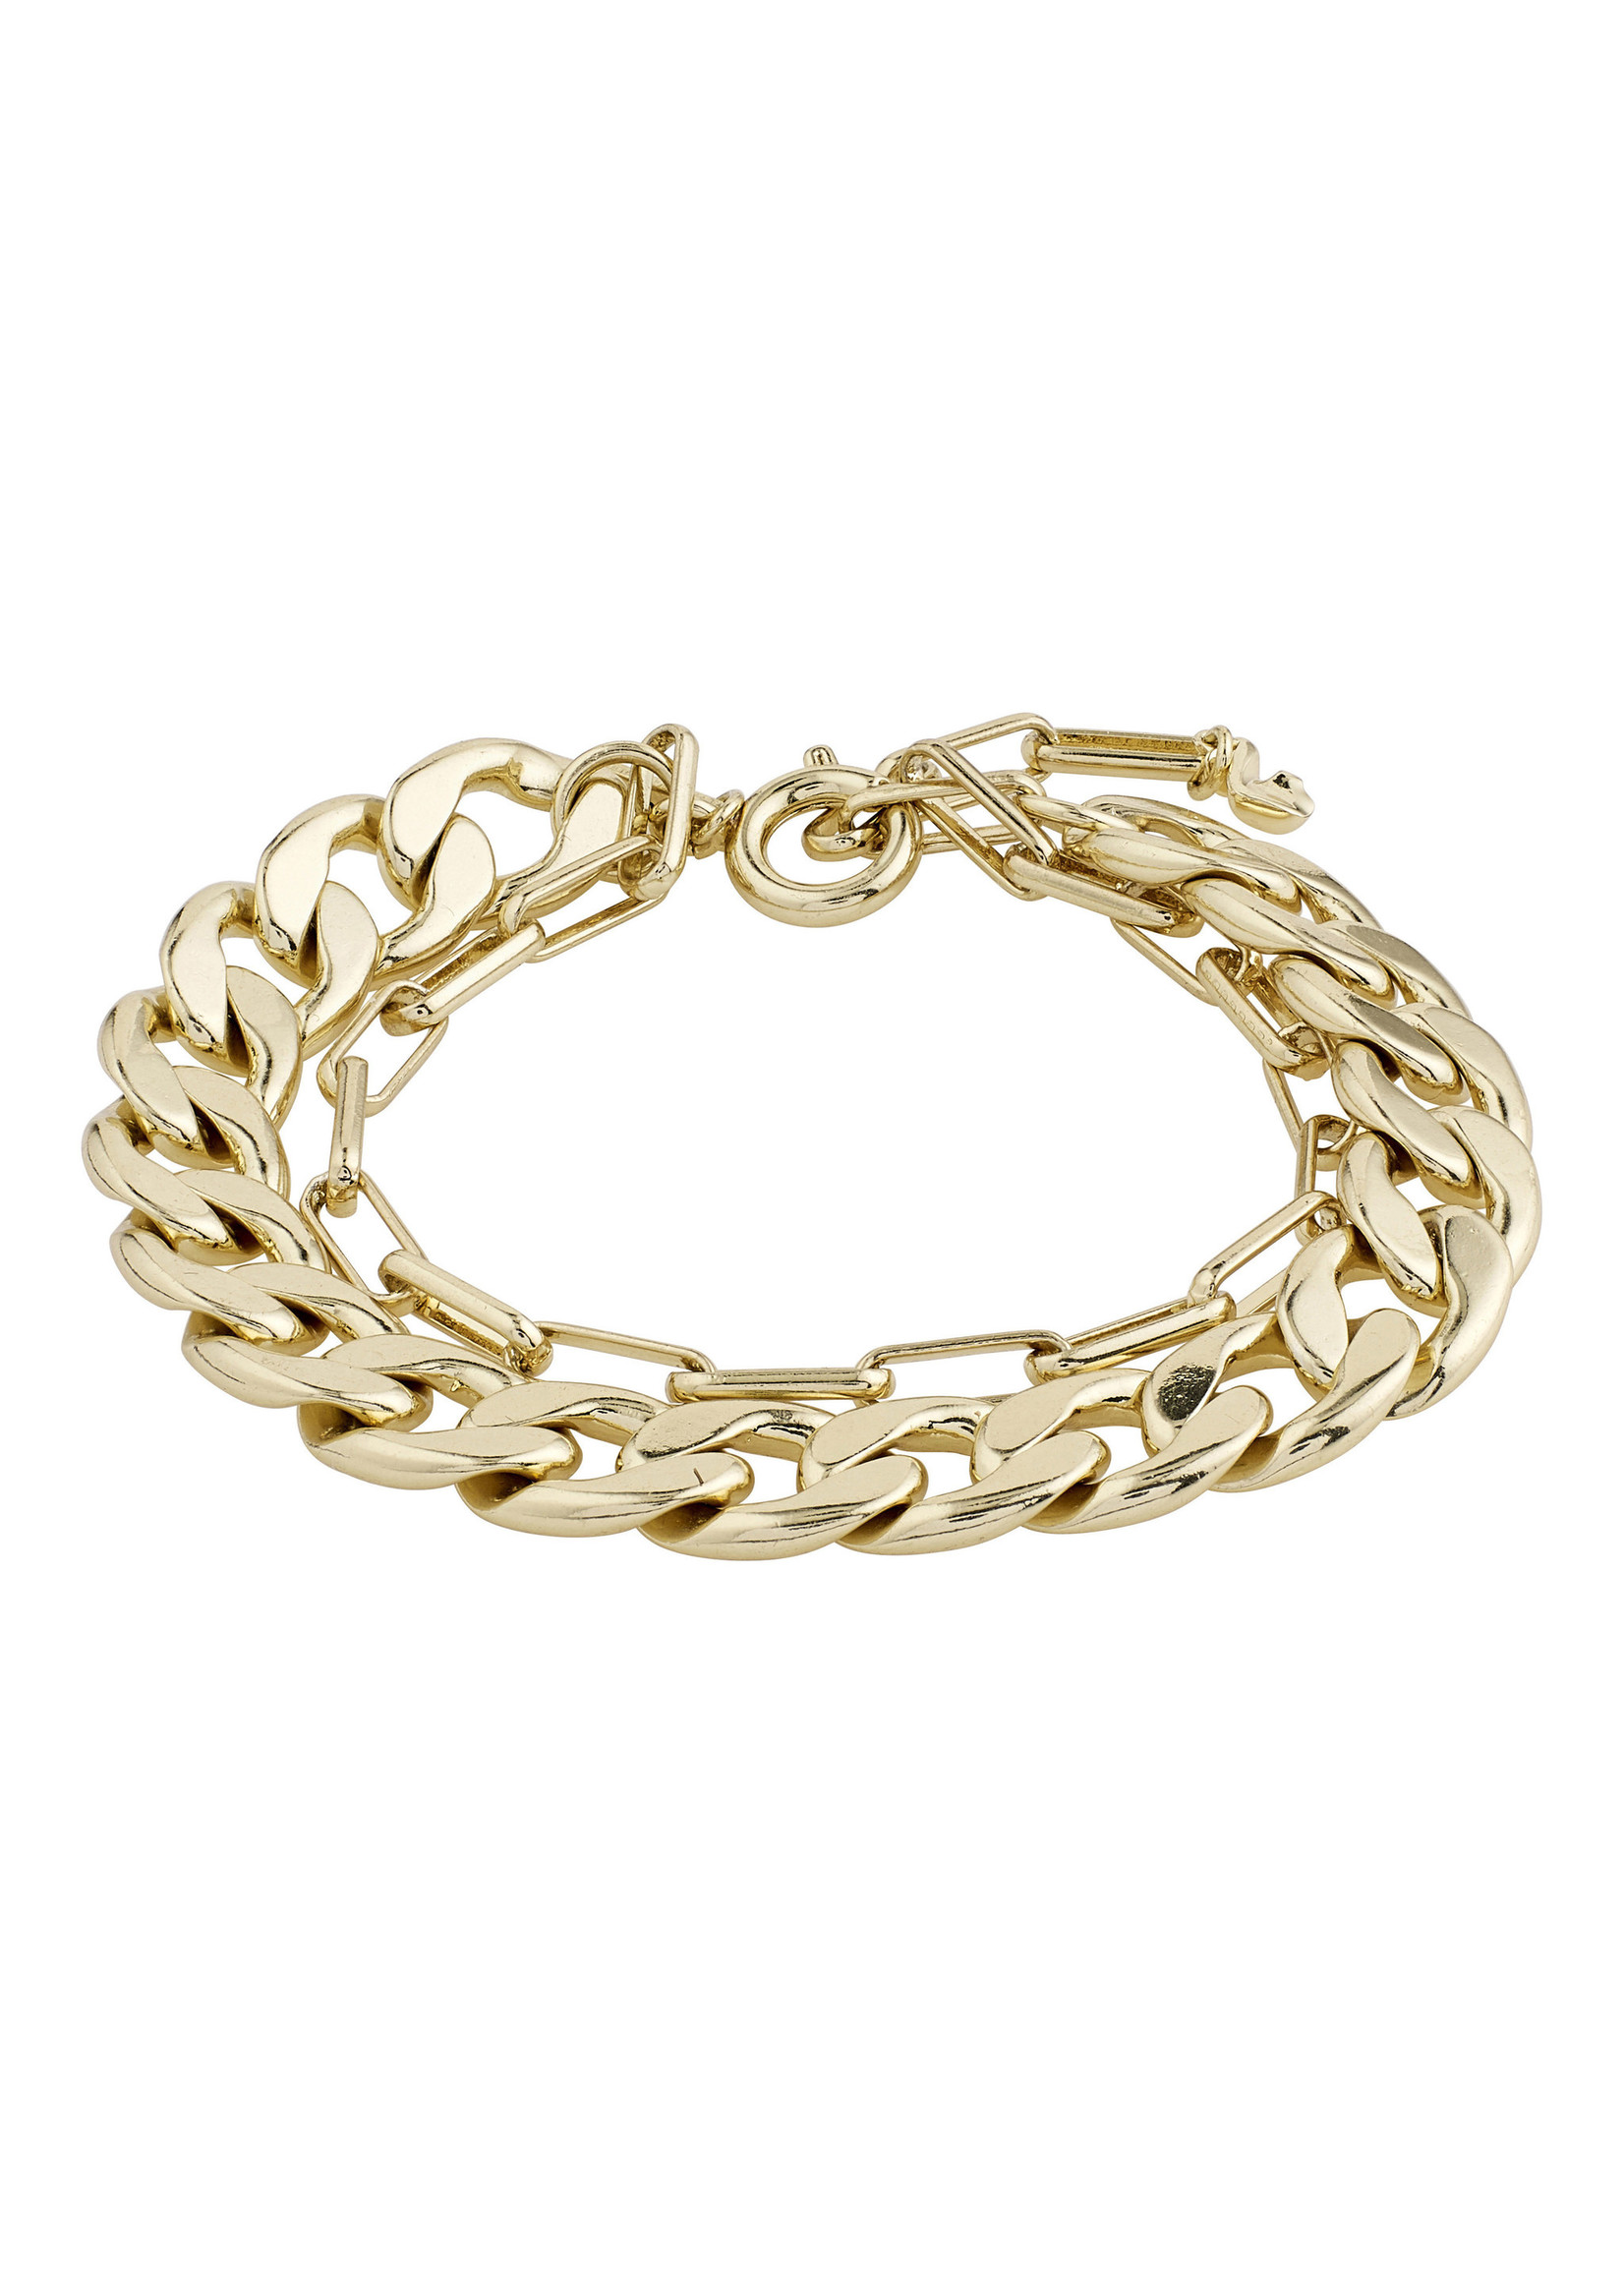 Layered Compass Bracelet - Gold